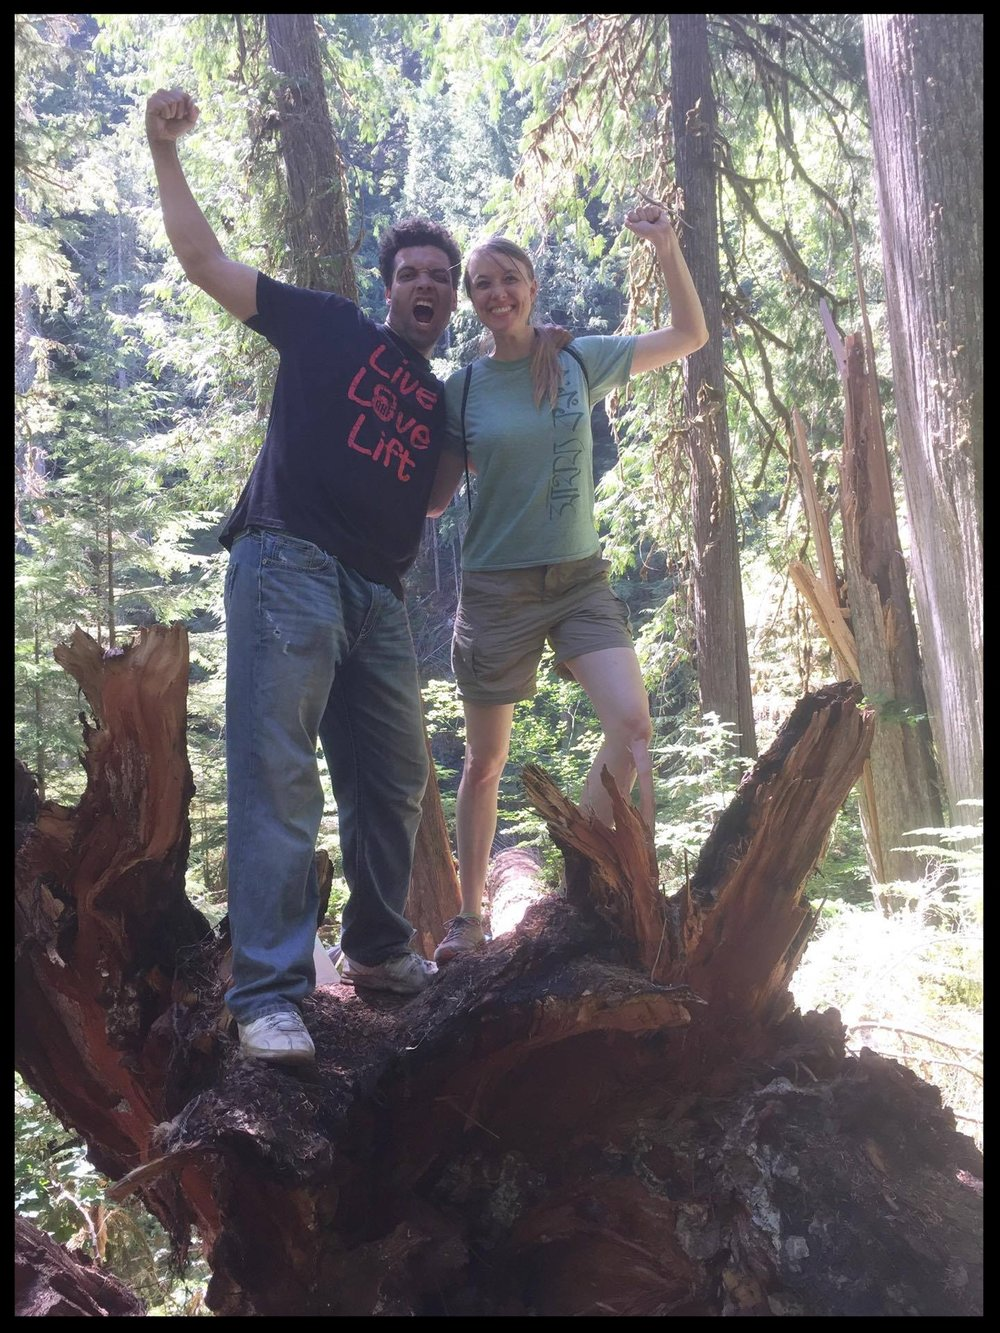 Hiking with my fiancélast weekend